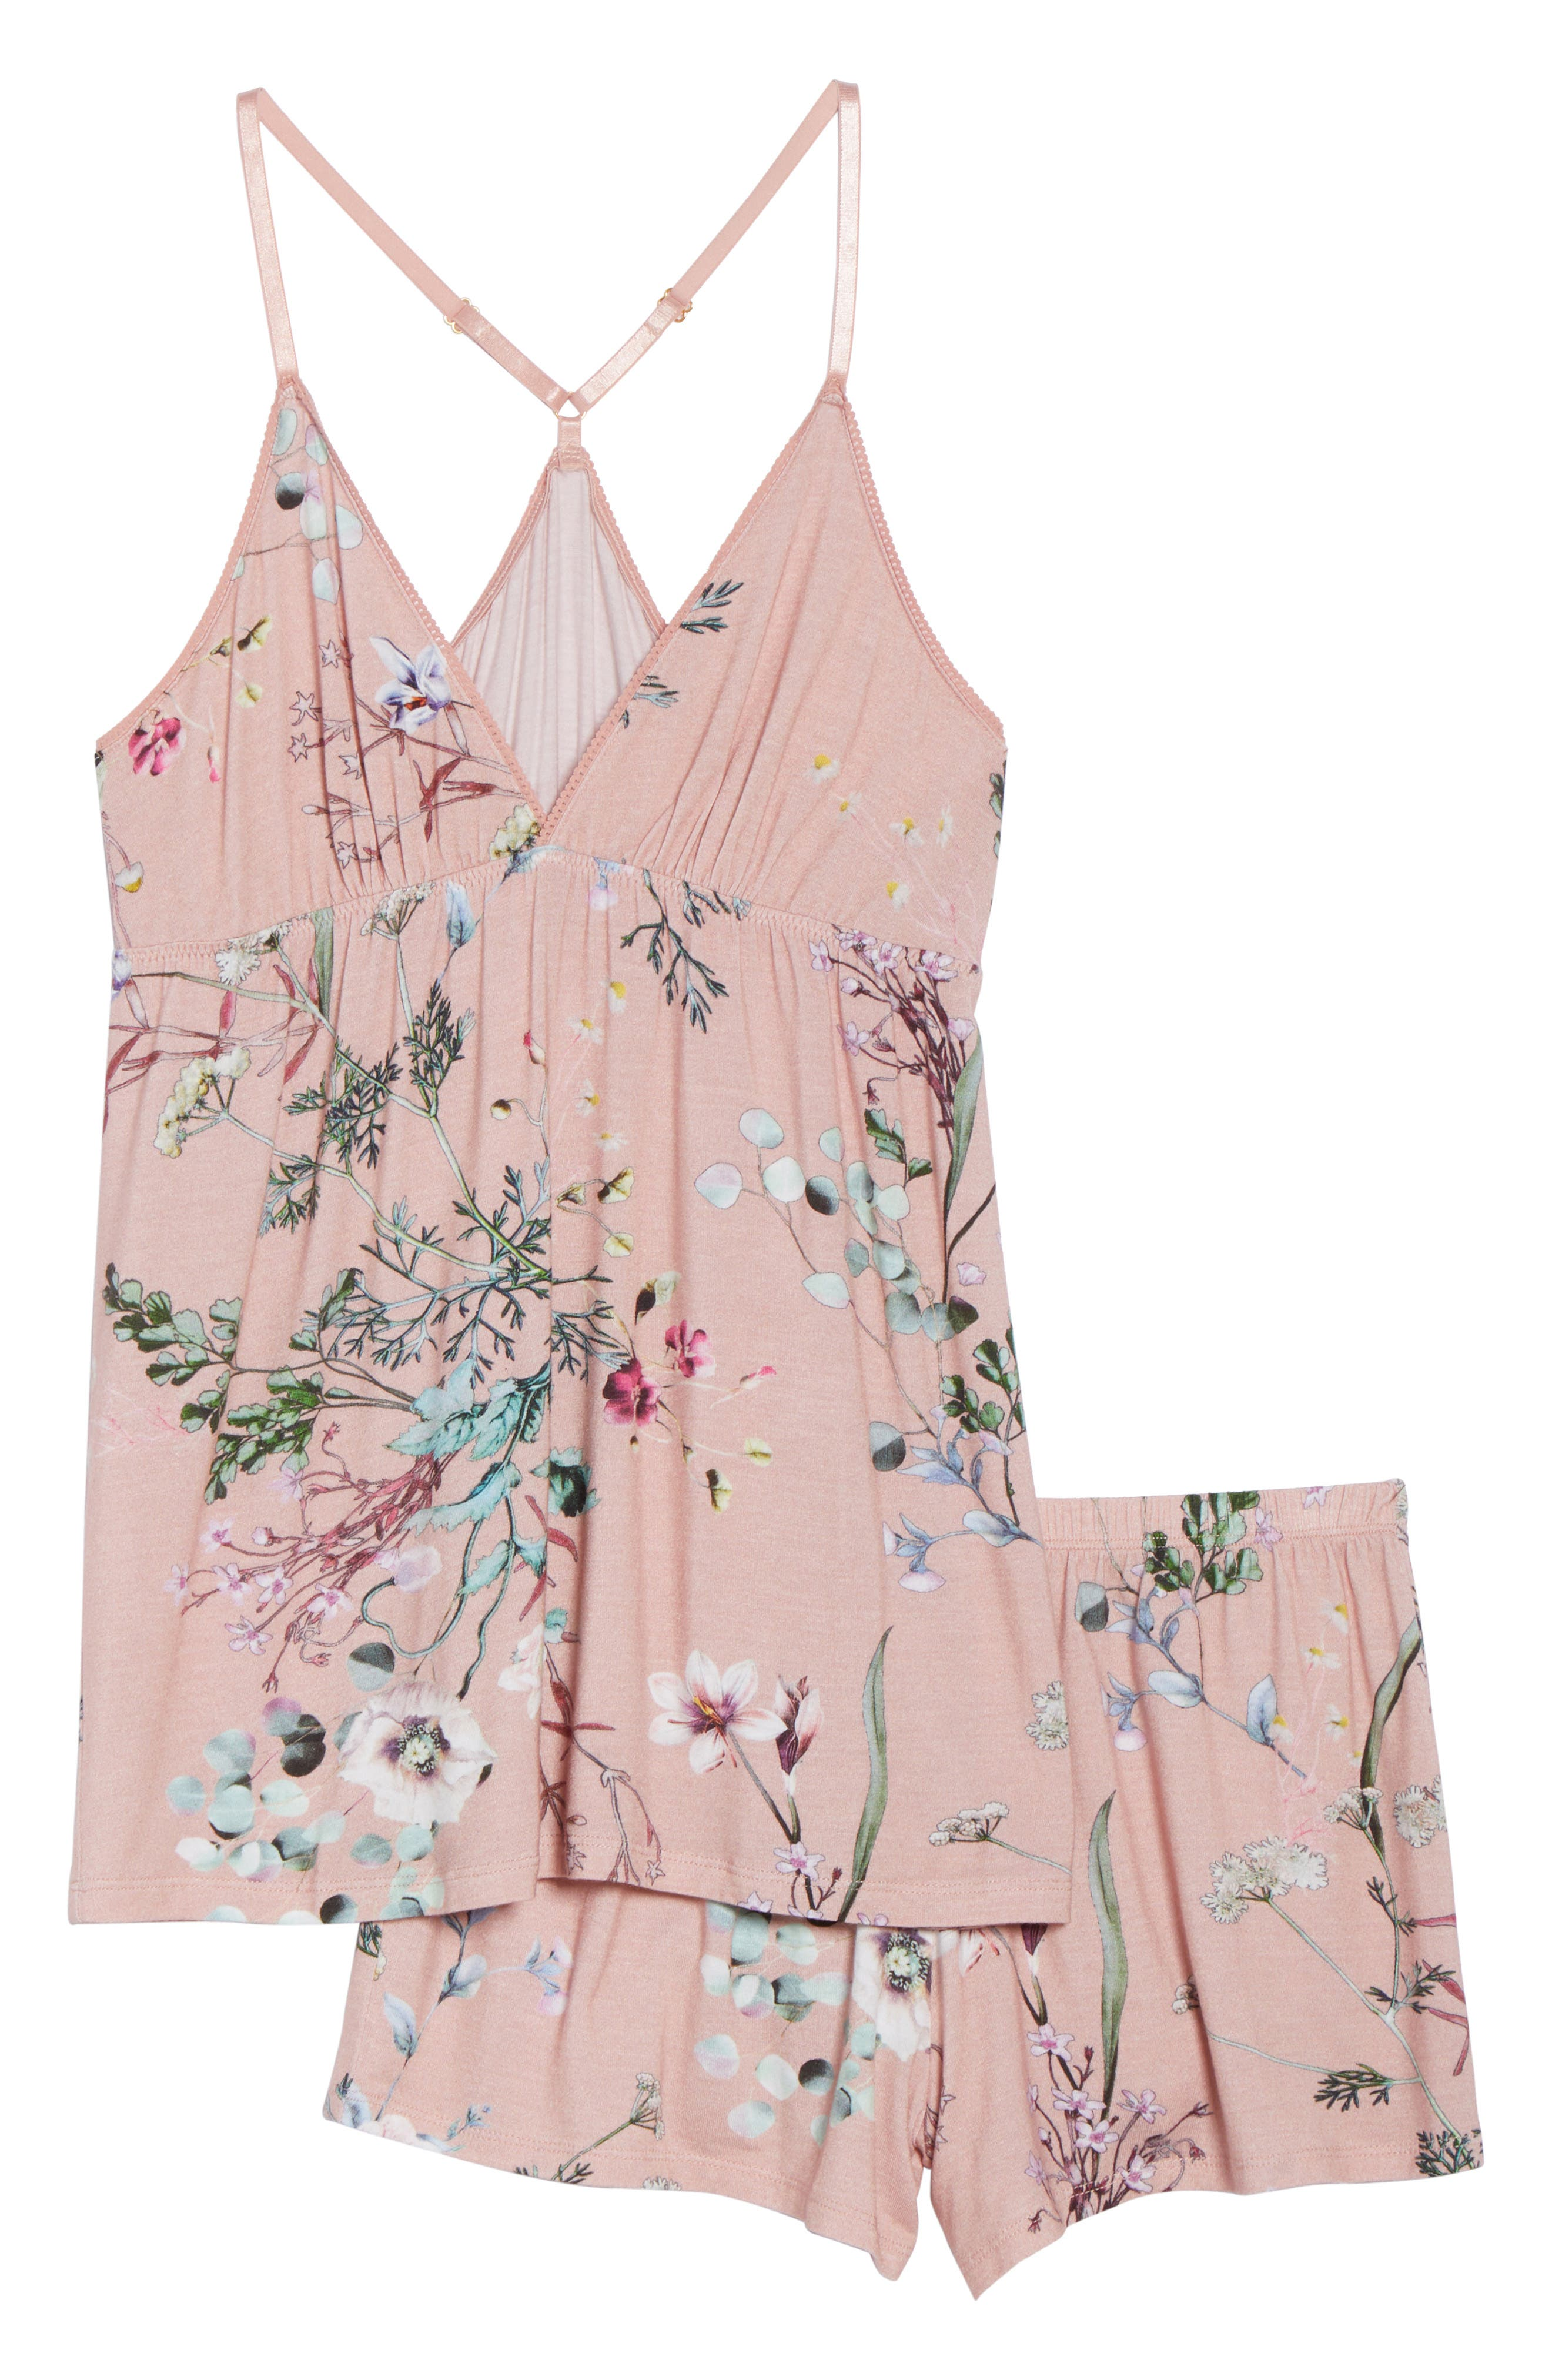 Floral Print Camisole Pajama Set,                             Alternate thumbnail 6, color,                             953